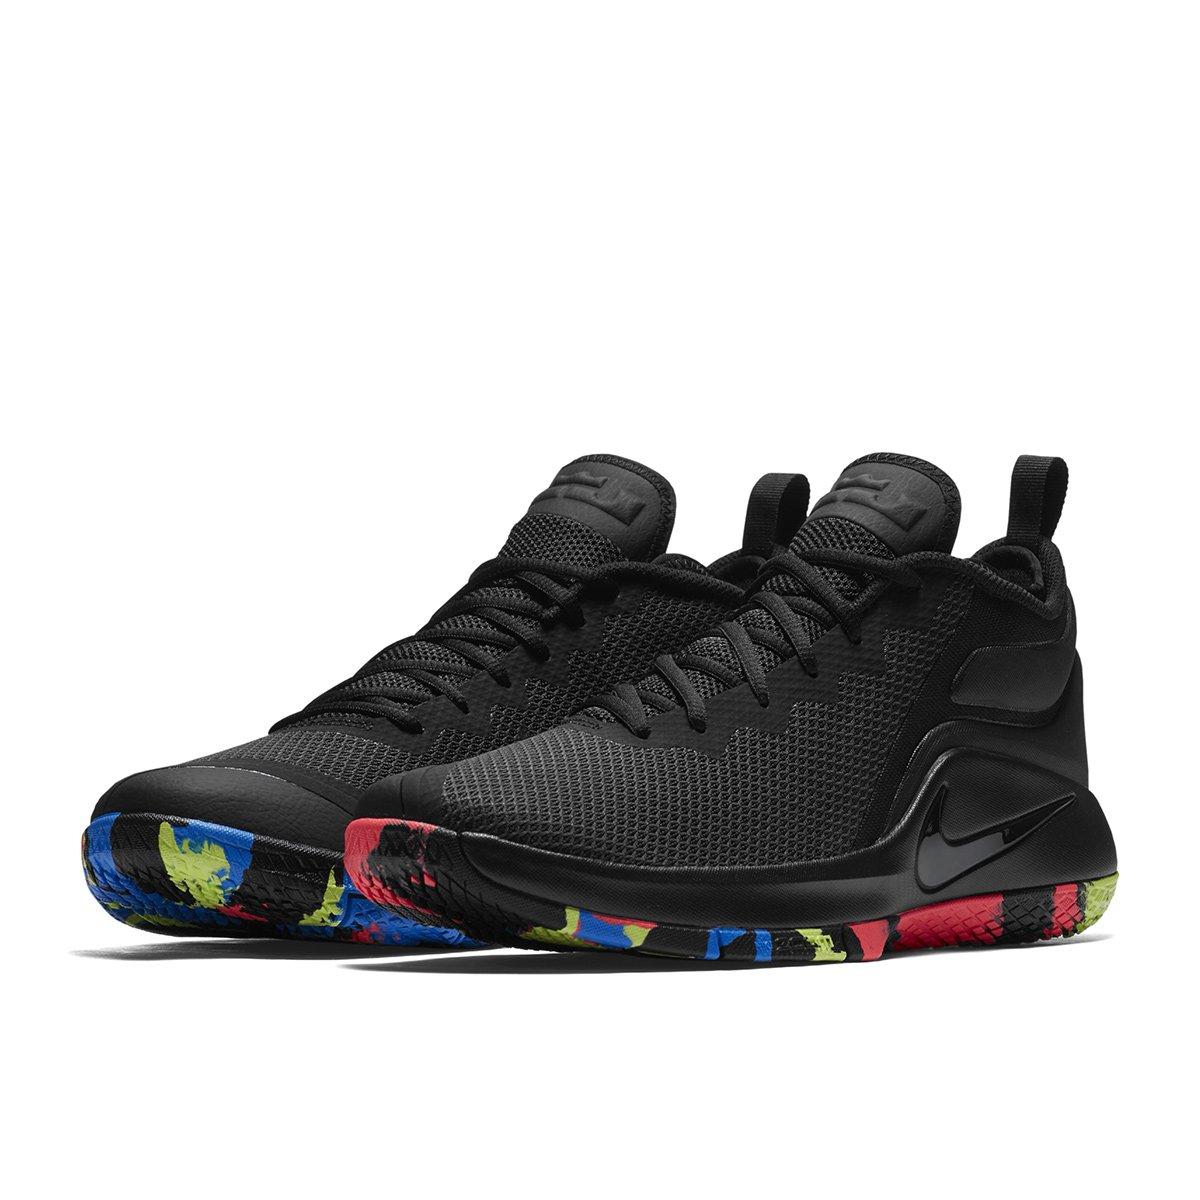 finest selection e3dd7 99dba Tênis Nike Lebron James Witness II Masculino   Loja NBA